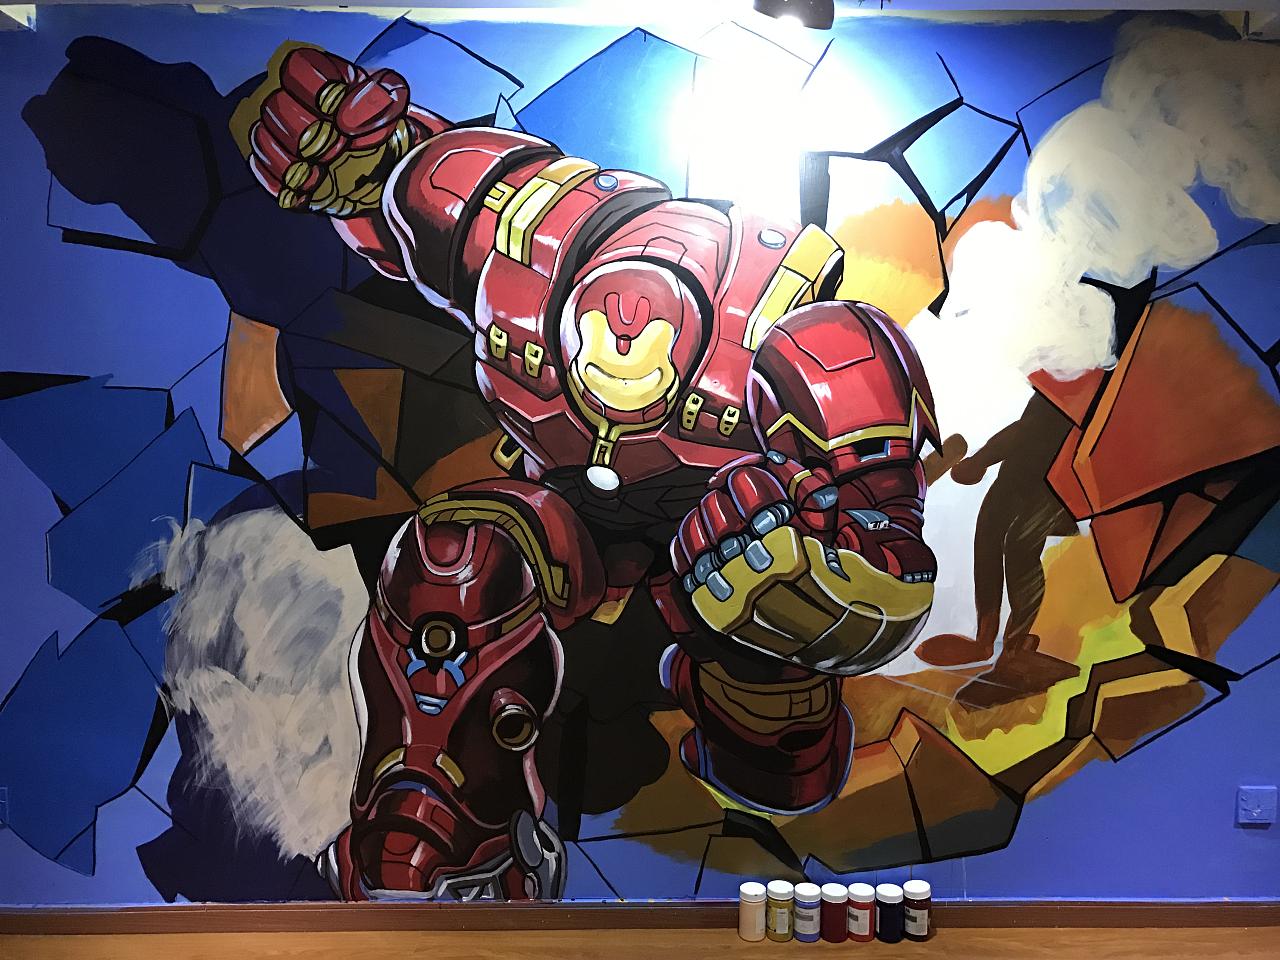 【3d加强版变形金刚】|其他|墙绘/立体画|绘汉zf图片